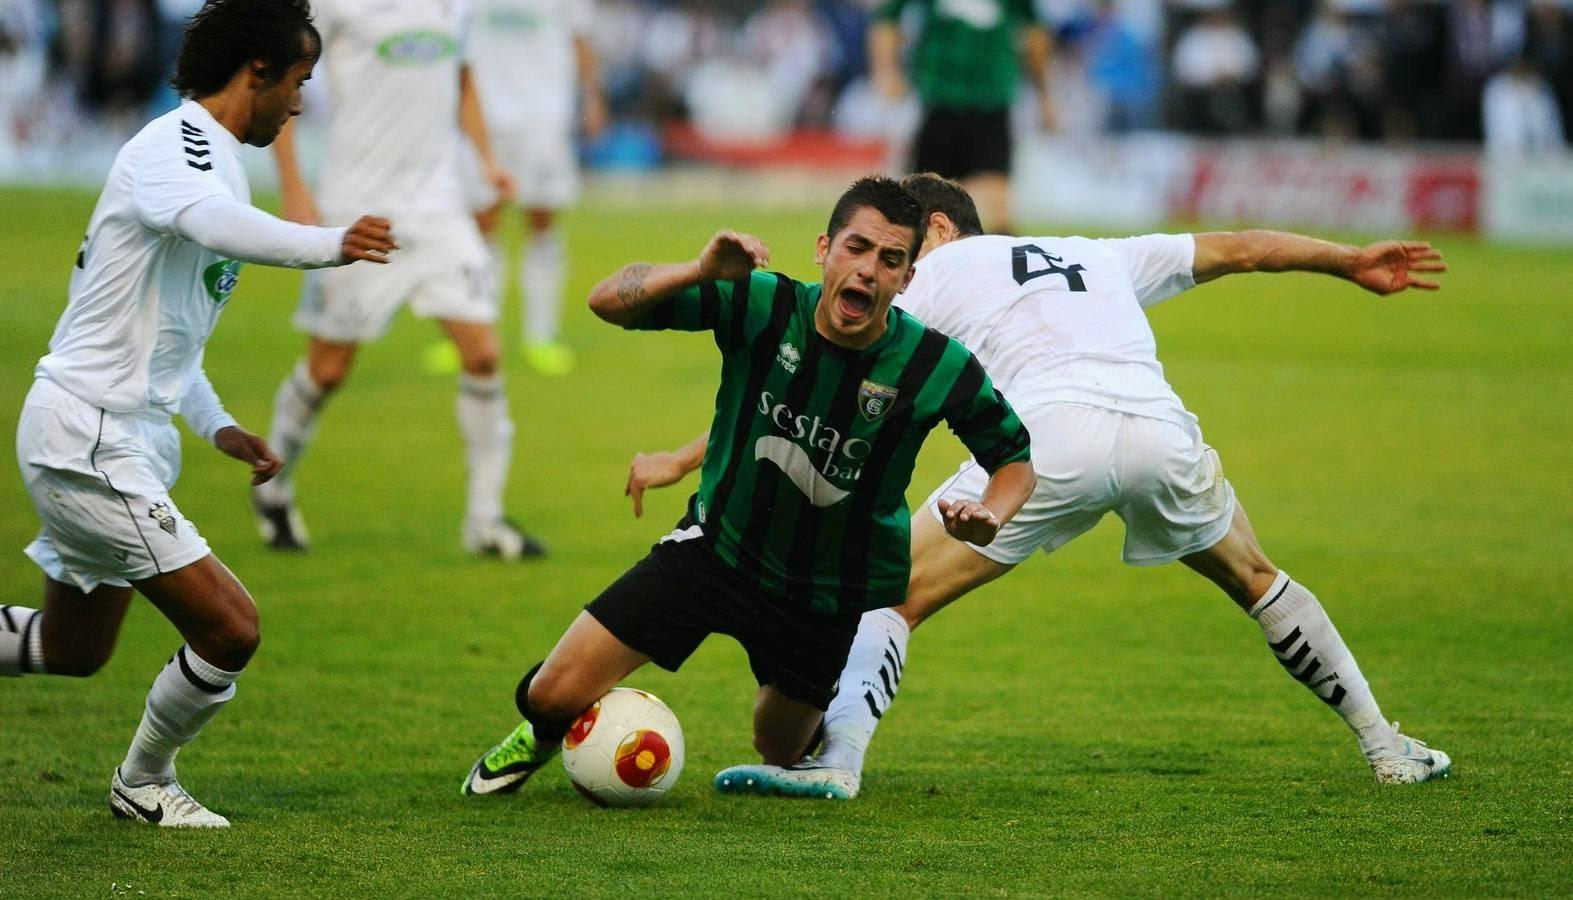 El Albacete empató a 3 en Sestao en un partido lleno de polémica